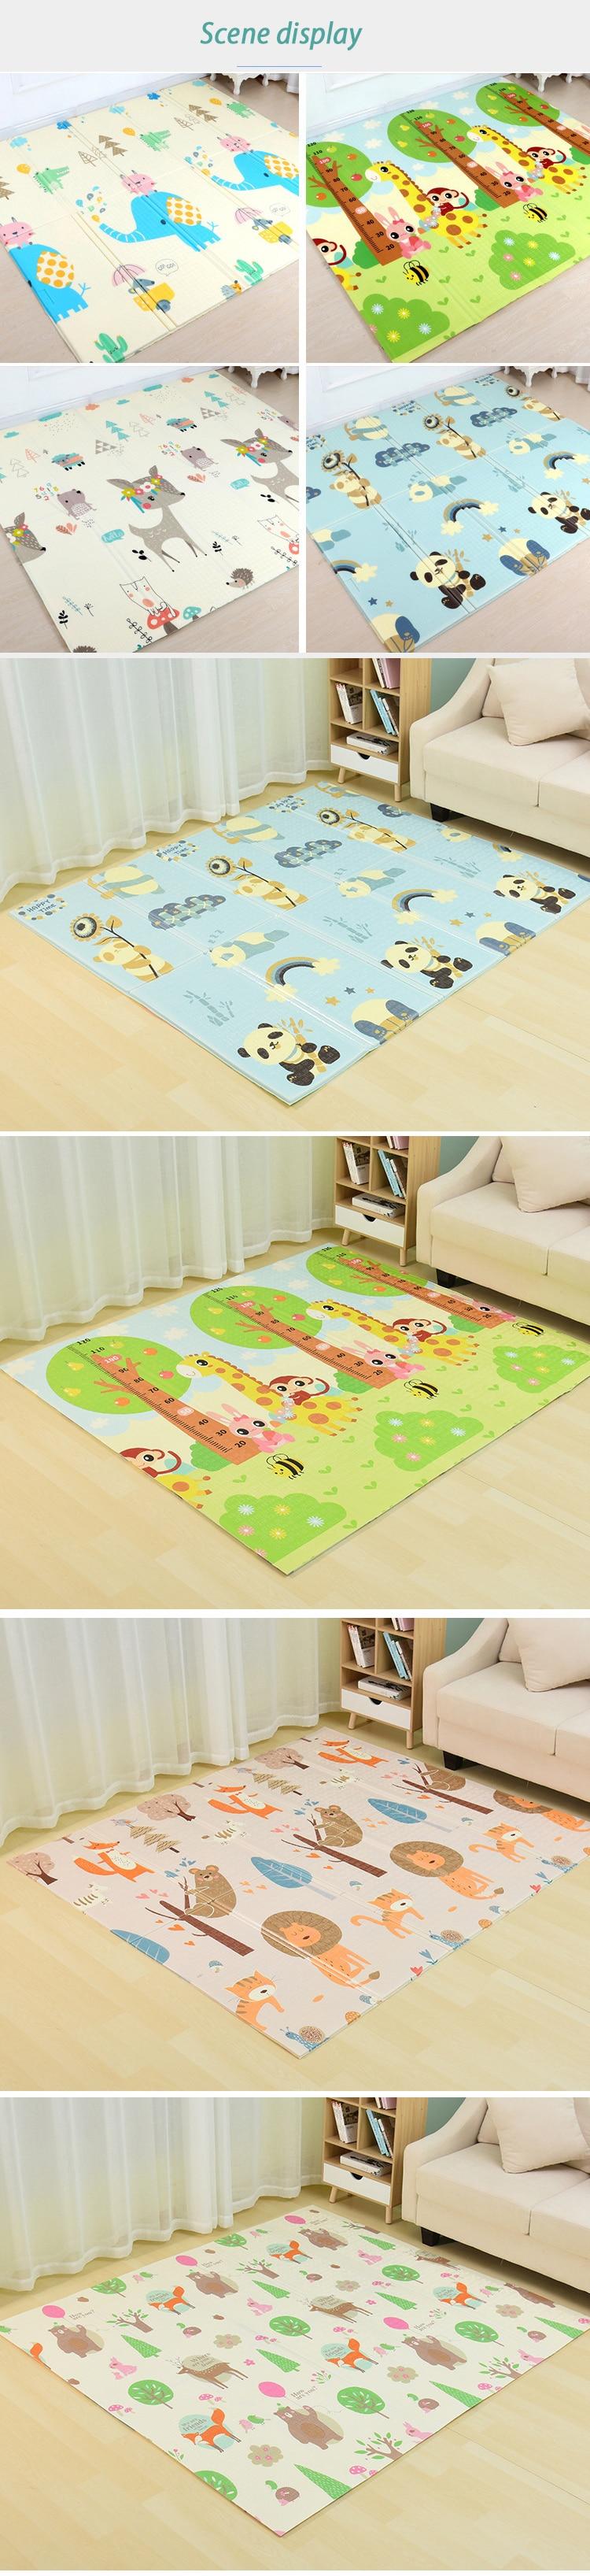 HTB12vw4X.LrK1Rjy0Fjq6zYXFXaf Infant Shining Baby Mat Playmat Kids Carpet Baby Play Mat 200*180*1cm Foam XPE Puzzle Game Pad for Infants Educational Soft Mat